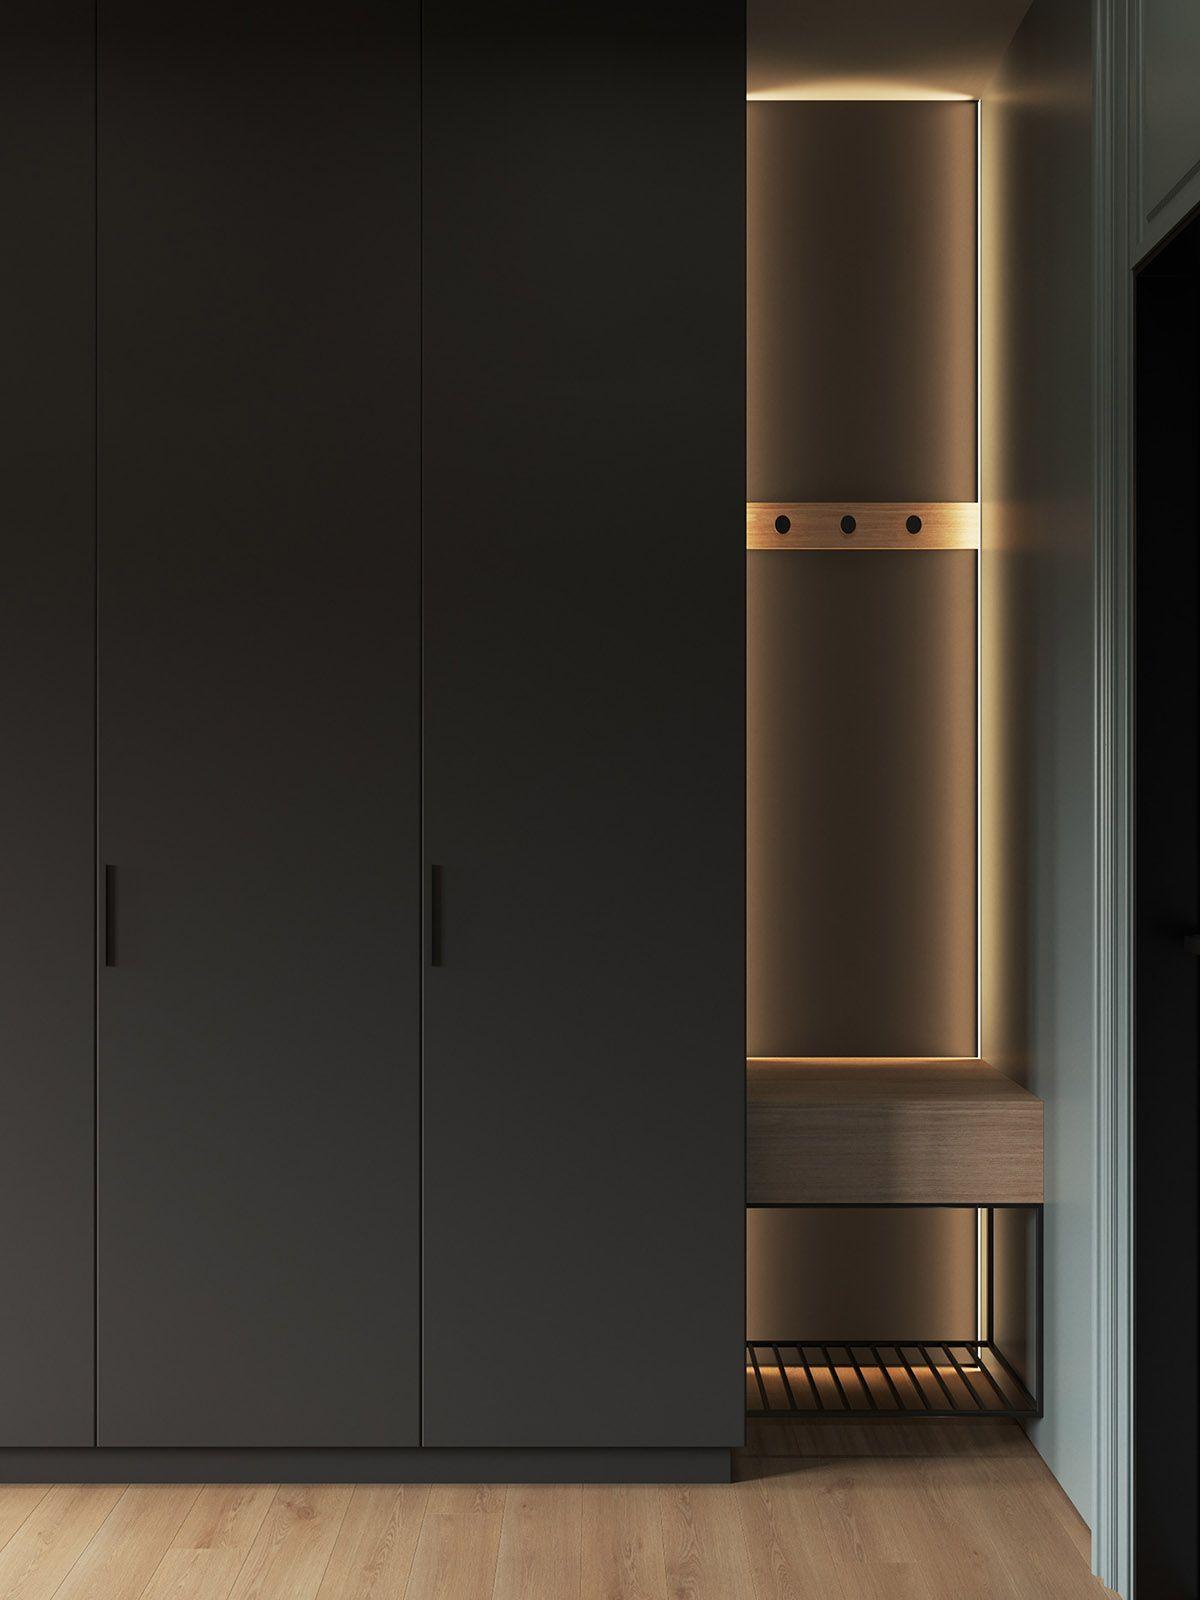 Photo of Interior Design Using Moody Colours And Natural Materials –  Interior Design Usi…